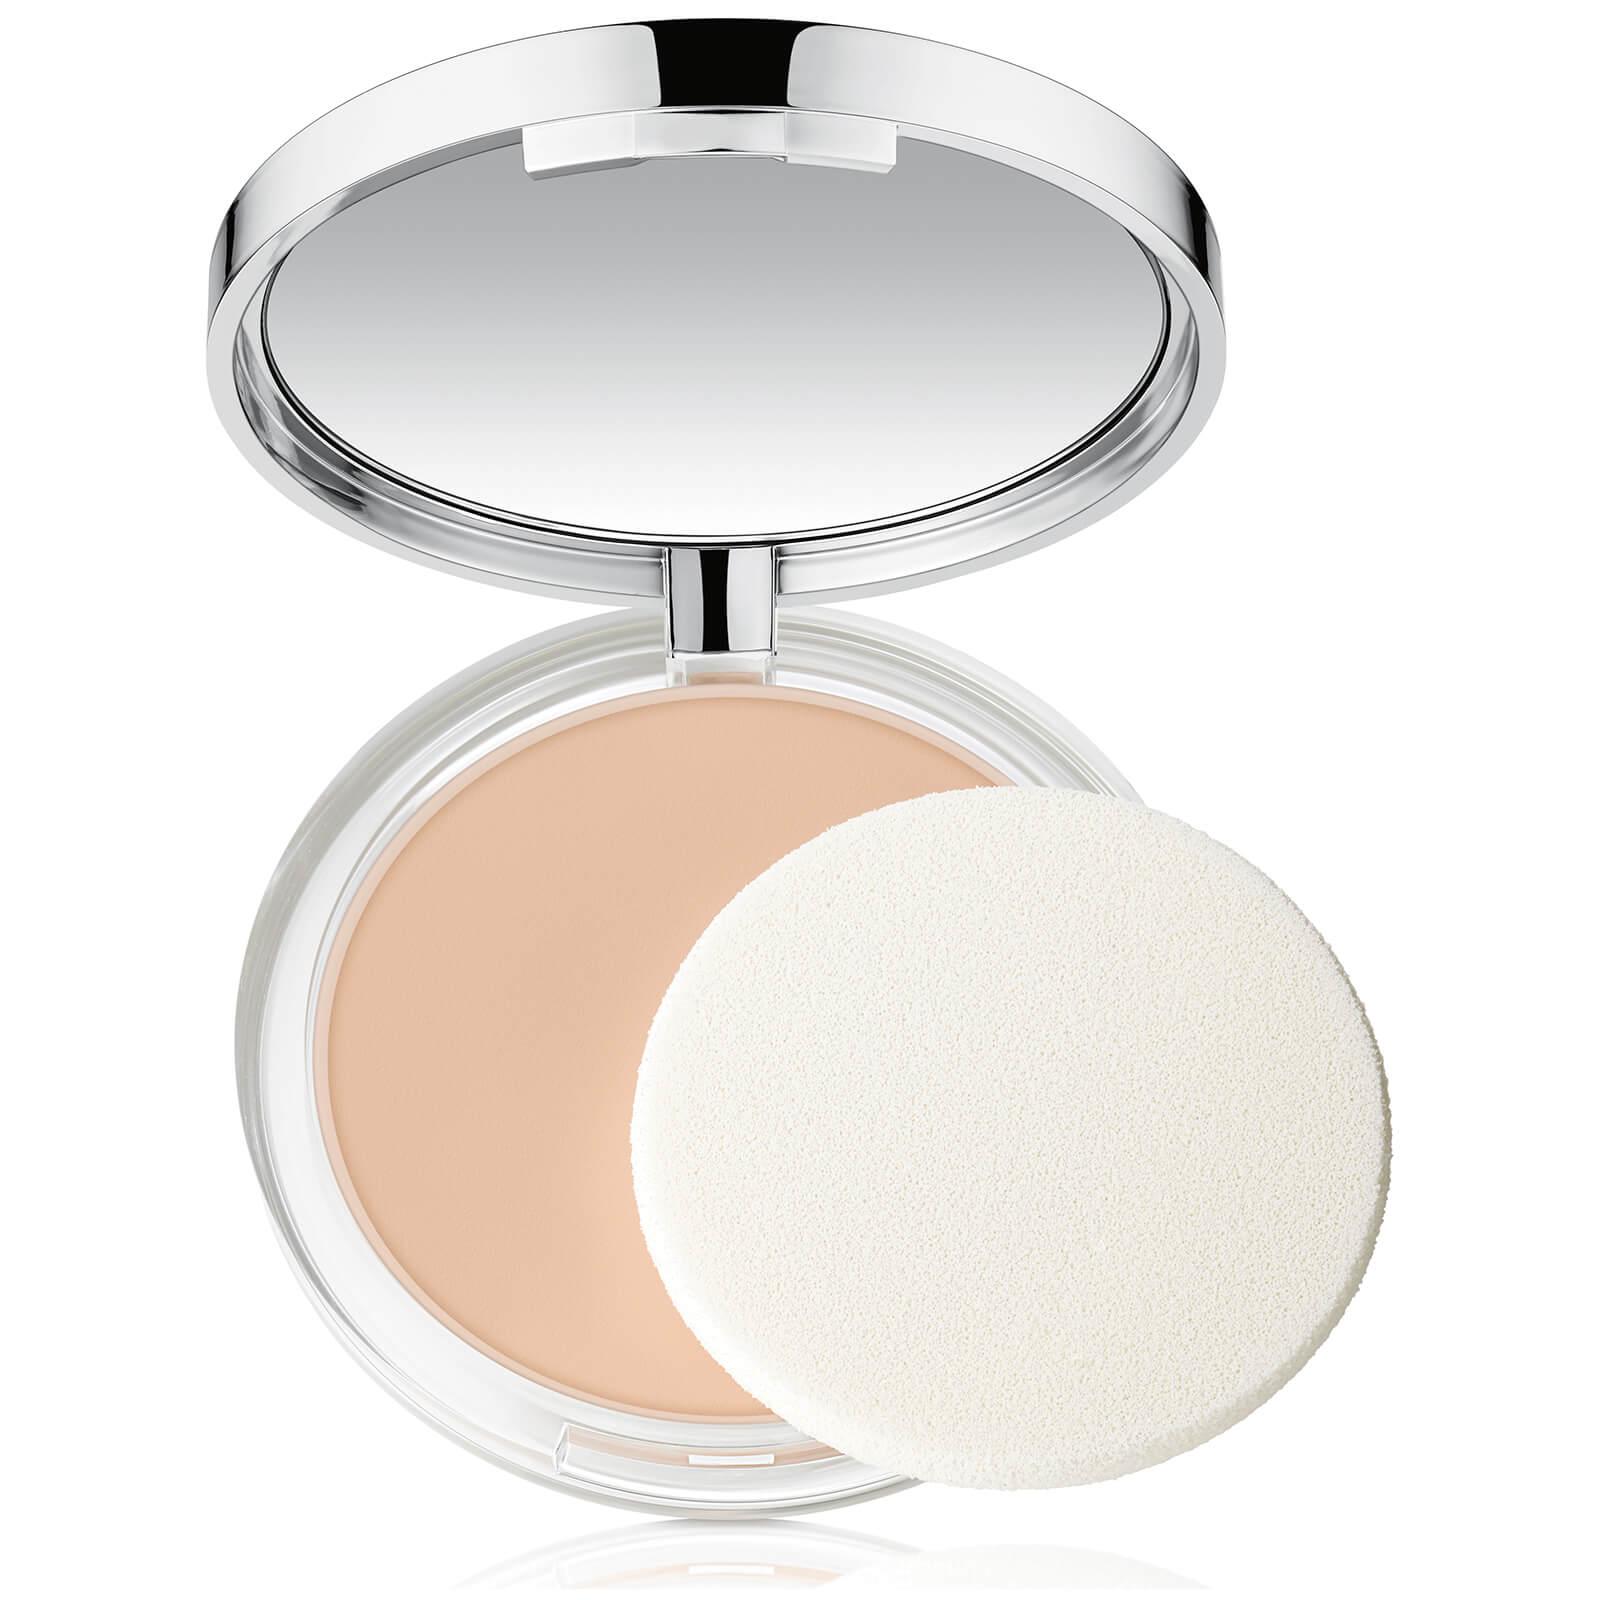 Clinique Almost Powder Makeup SPF15 -meikkipuuteri, 10g - Neutral Fair